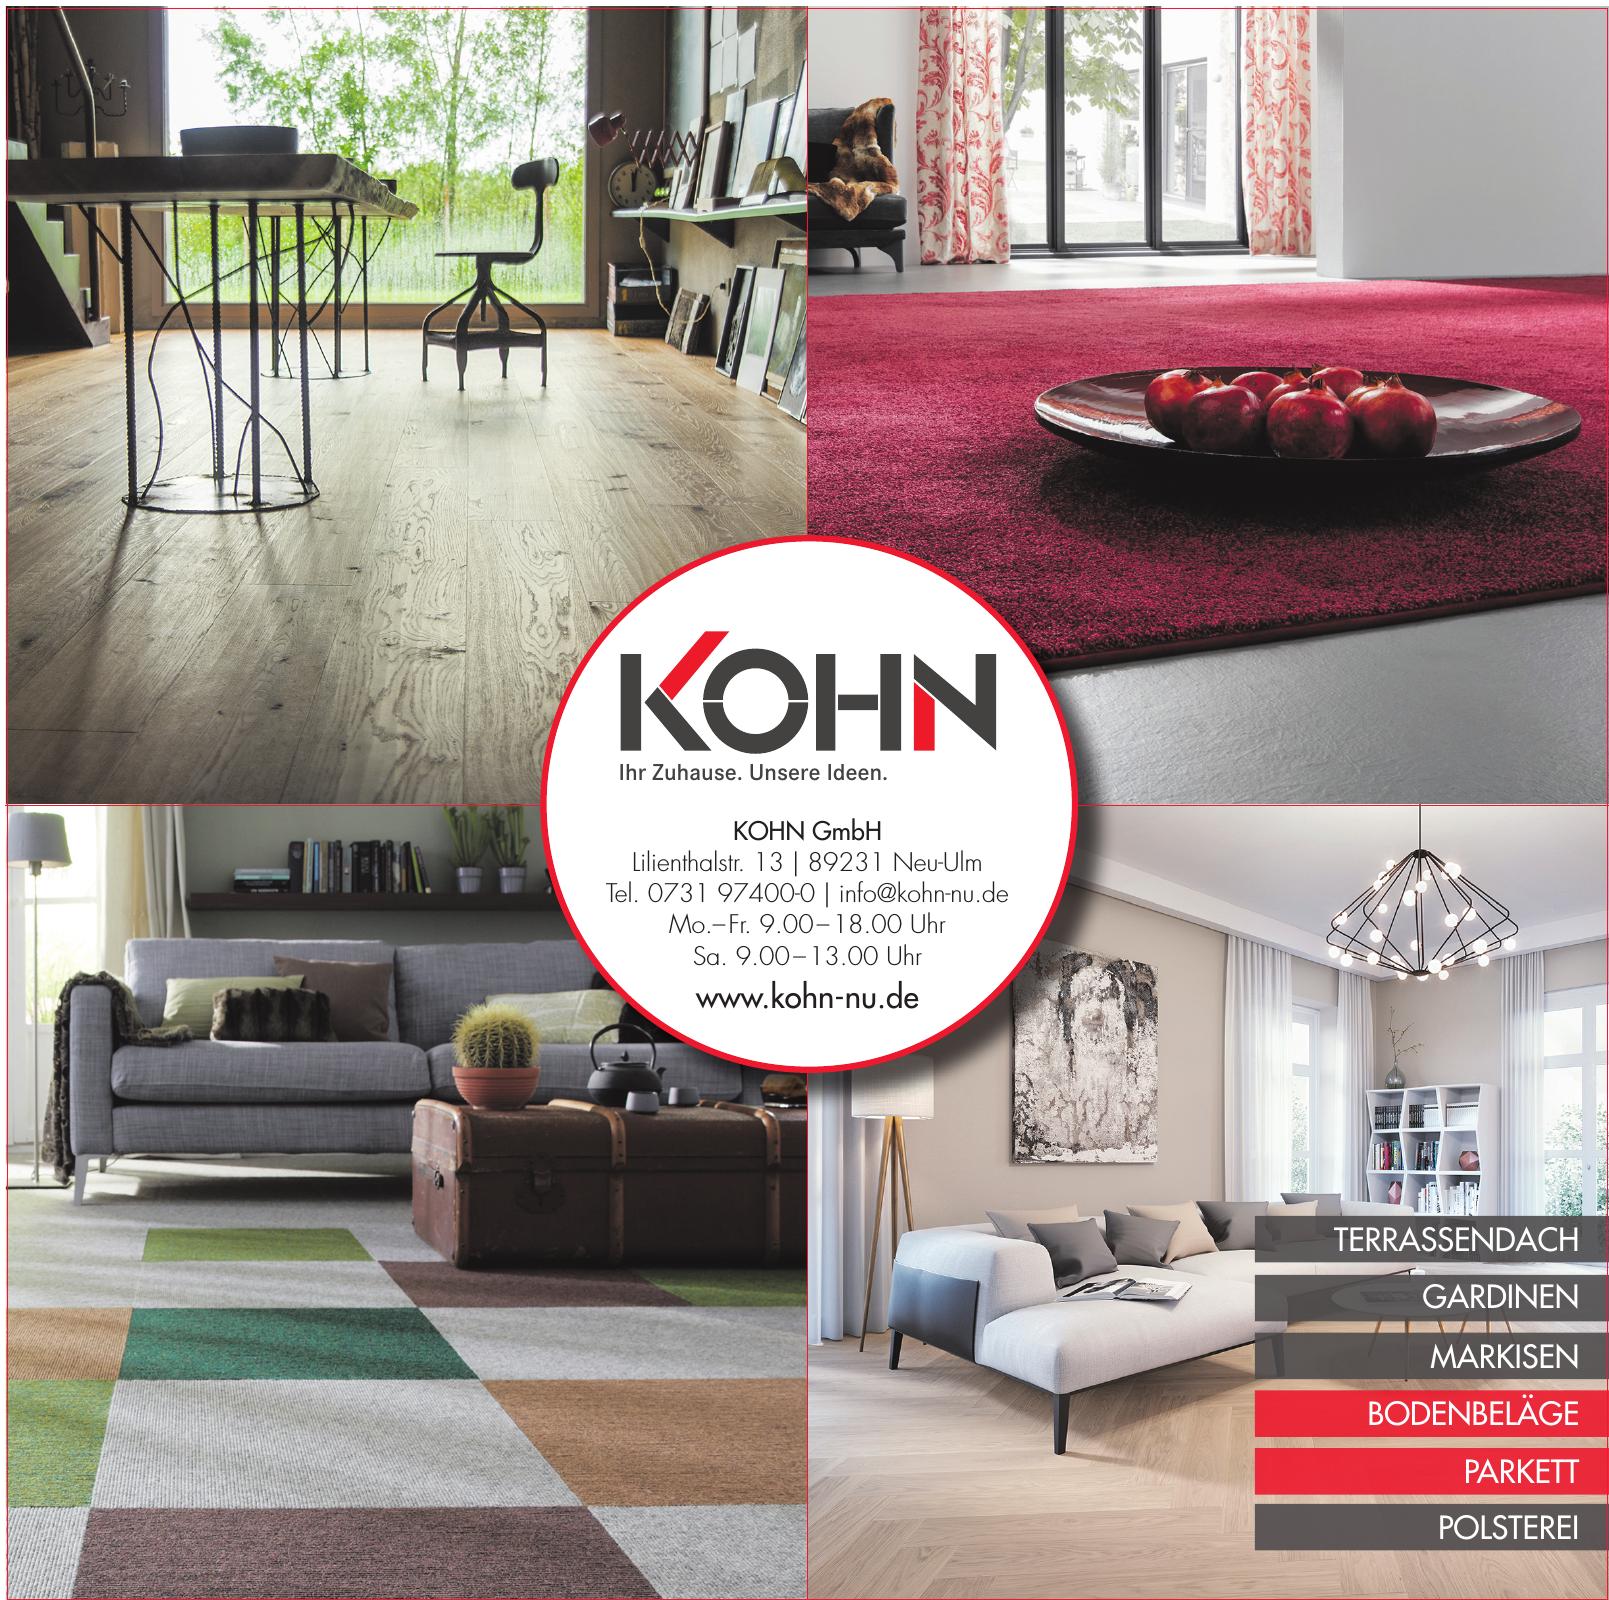 Kohn GmbH